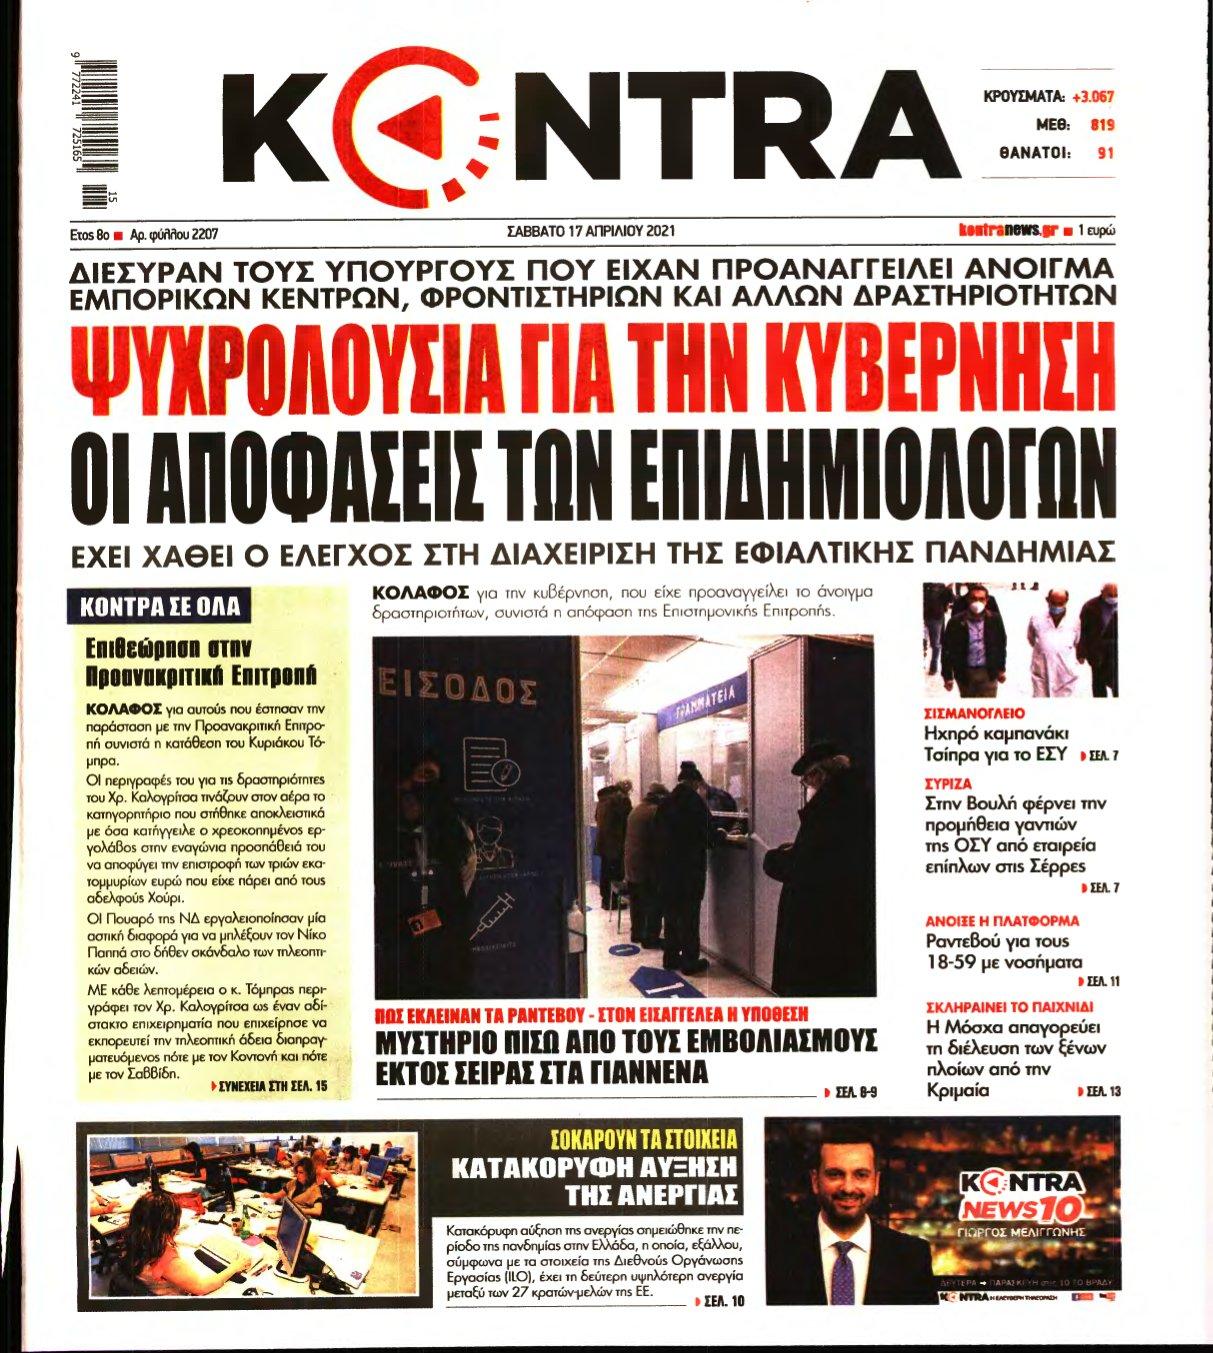 KONTRA NEWS – 17/04/2021